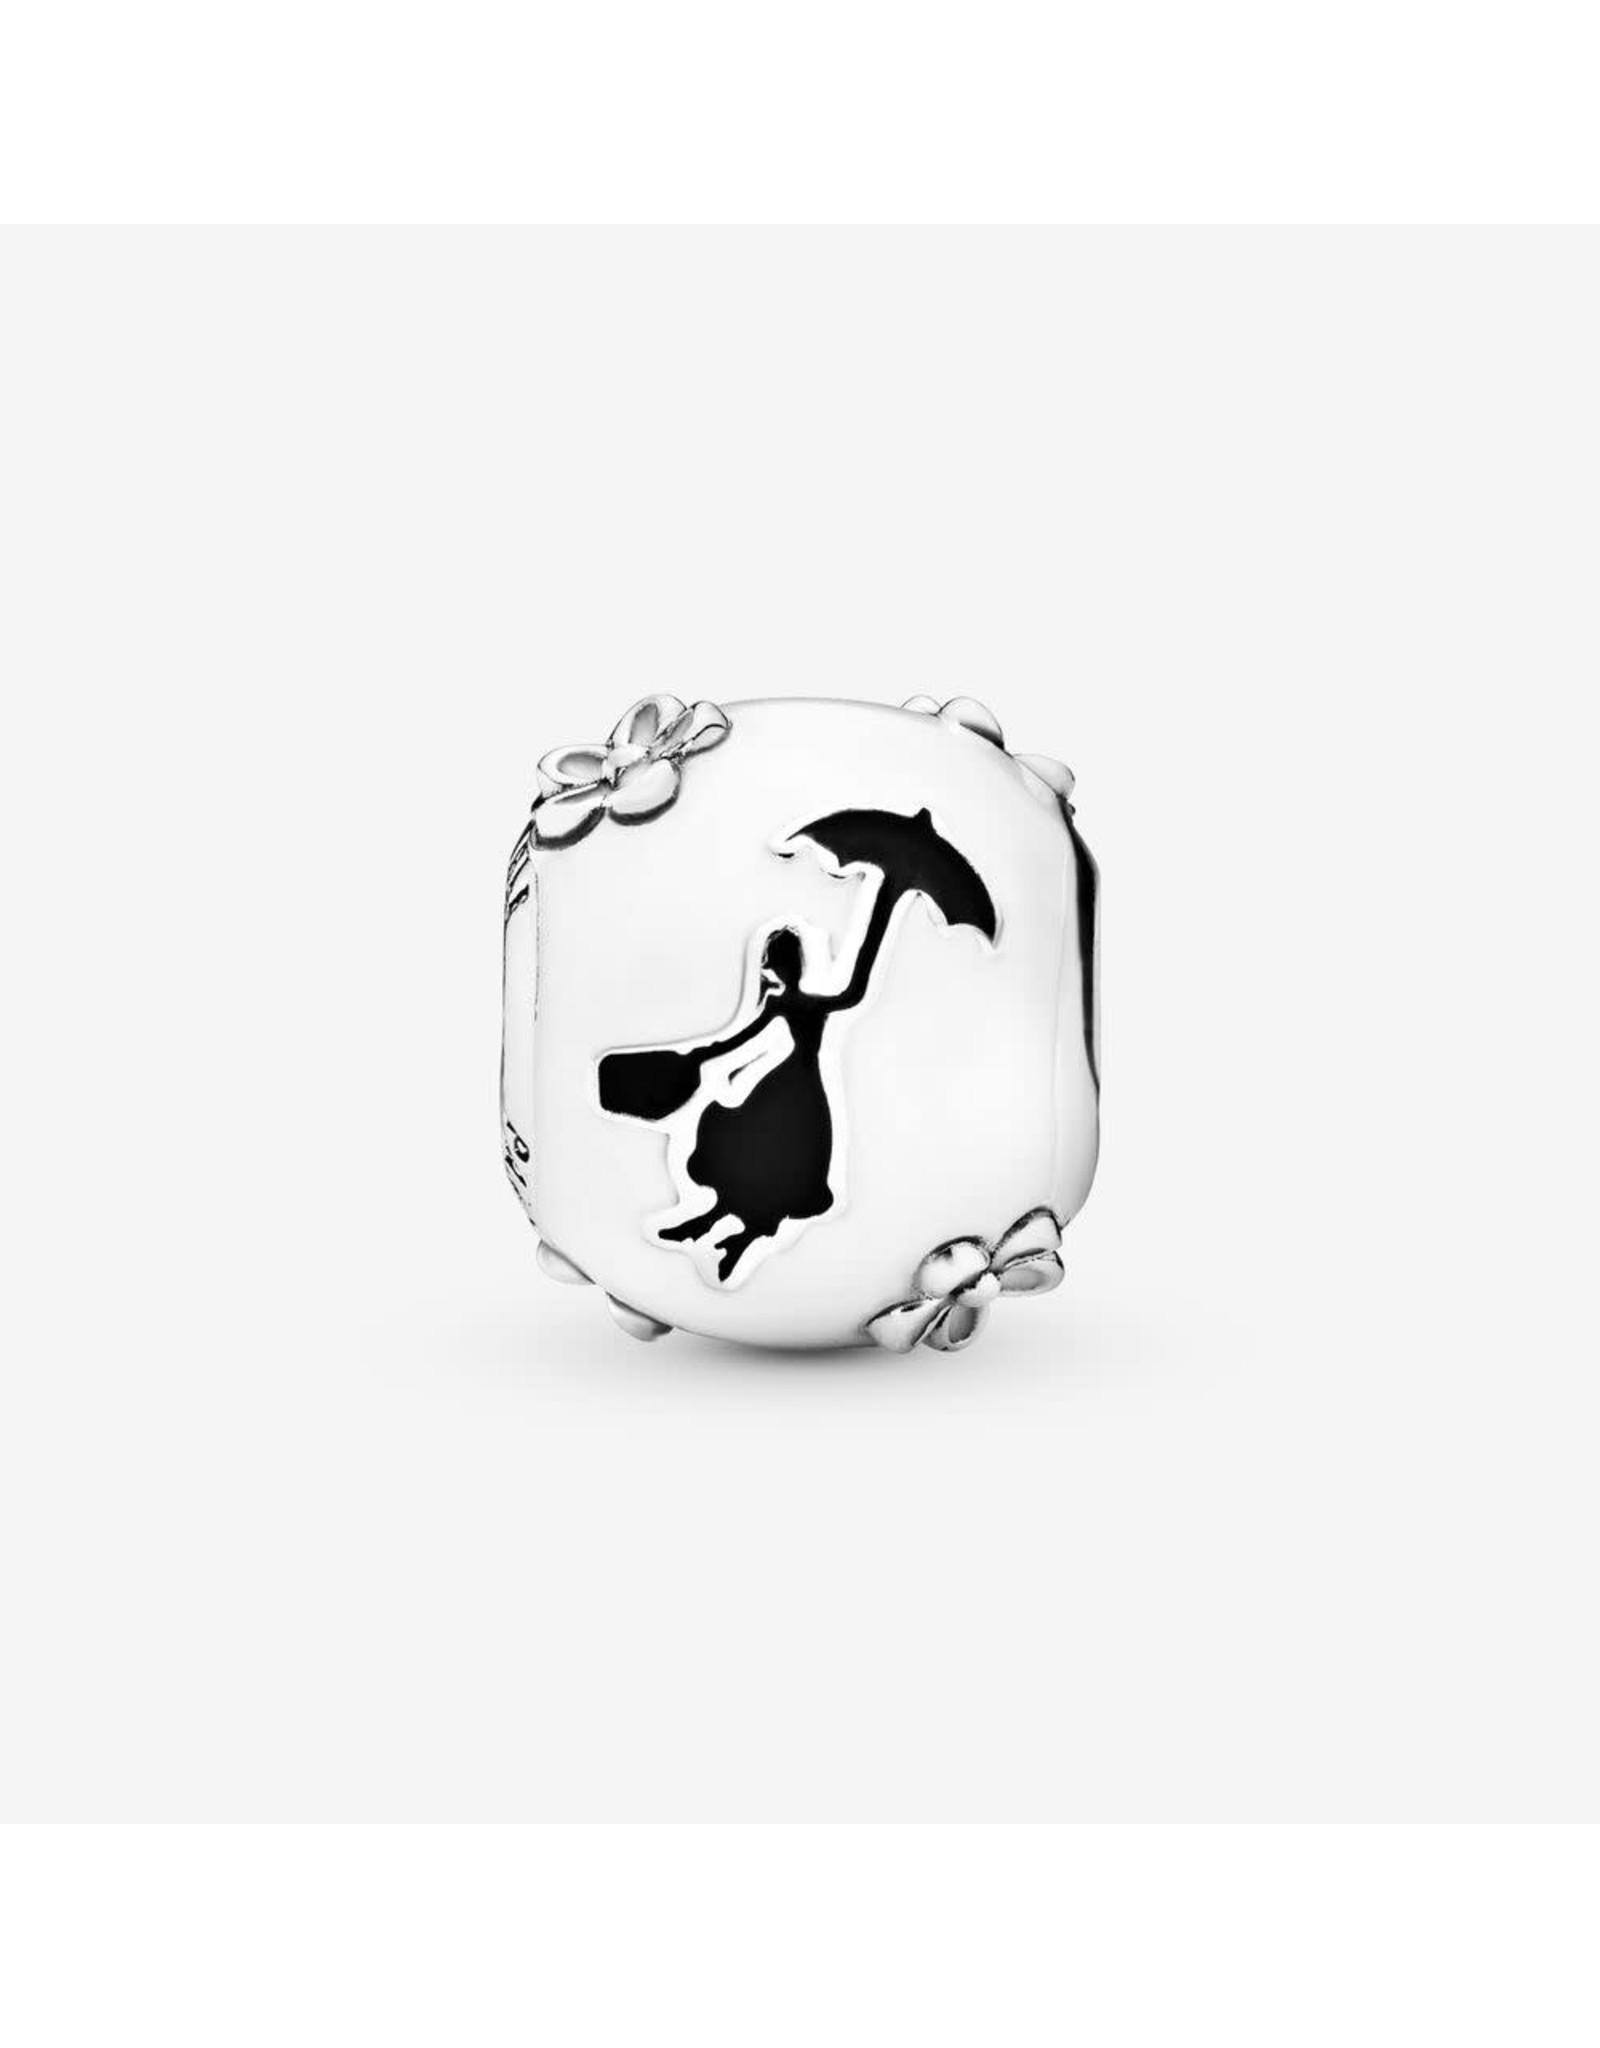 Pandora Pandora Charm, 797510ENMX,Disney Mary Poppins Silhouette